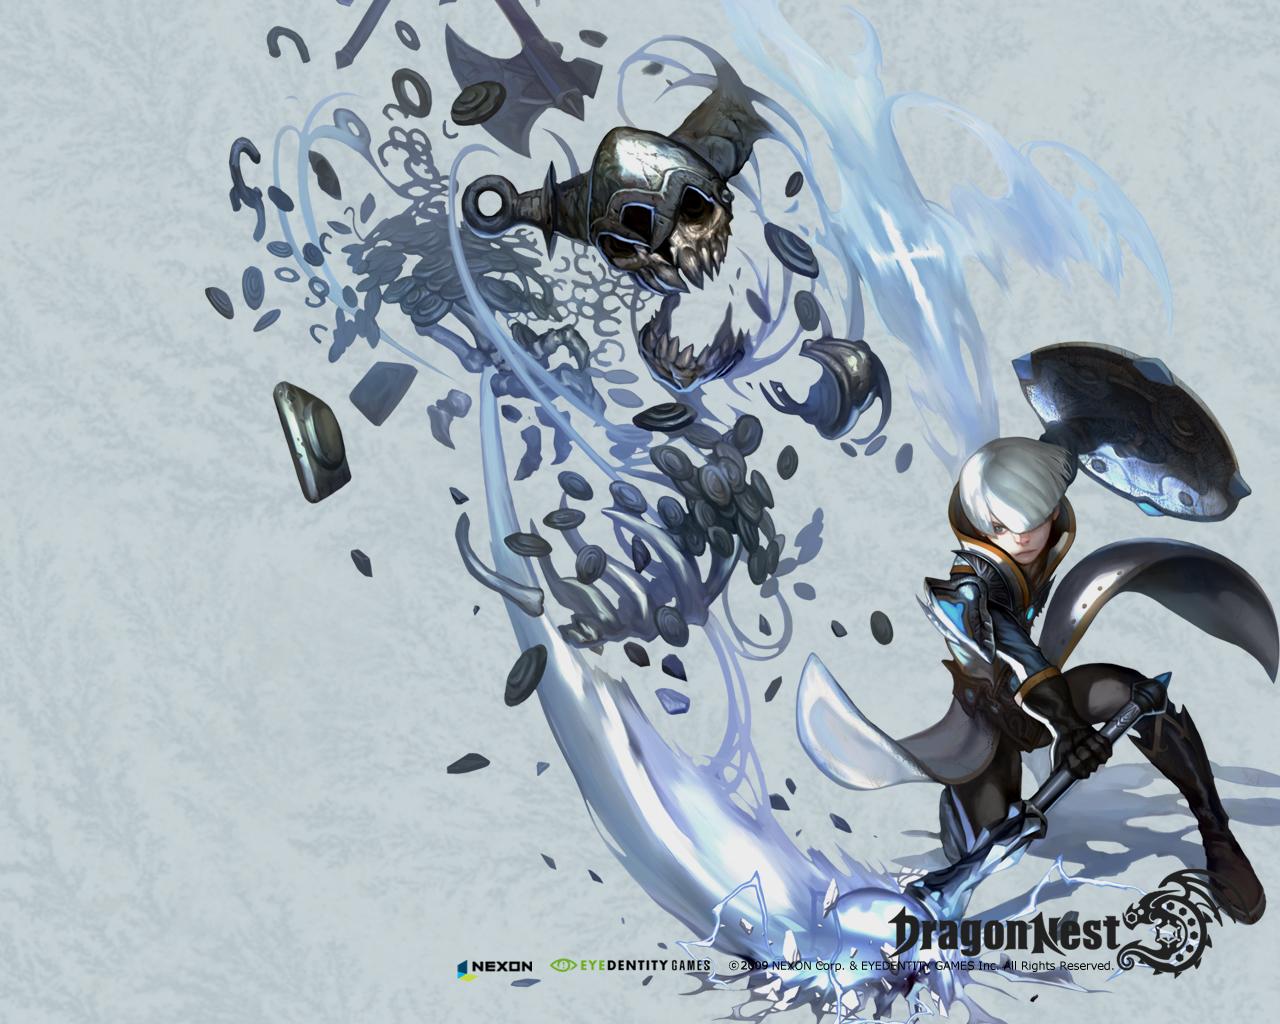 newest hd pics: Dragon Nest - 0.87318486694967